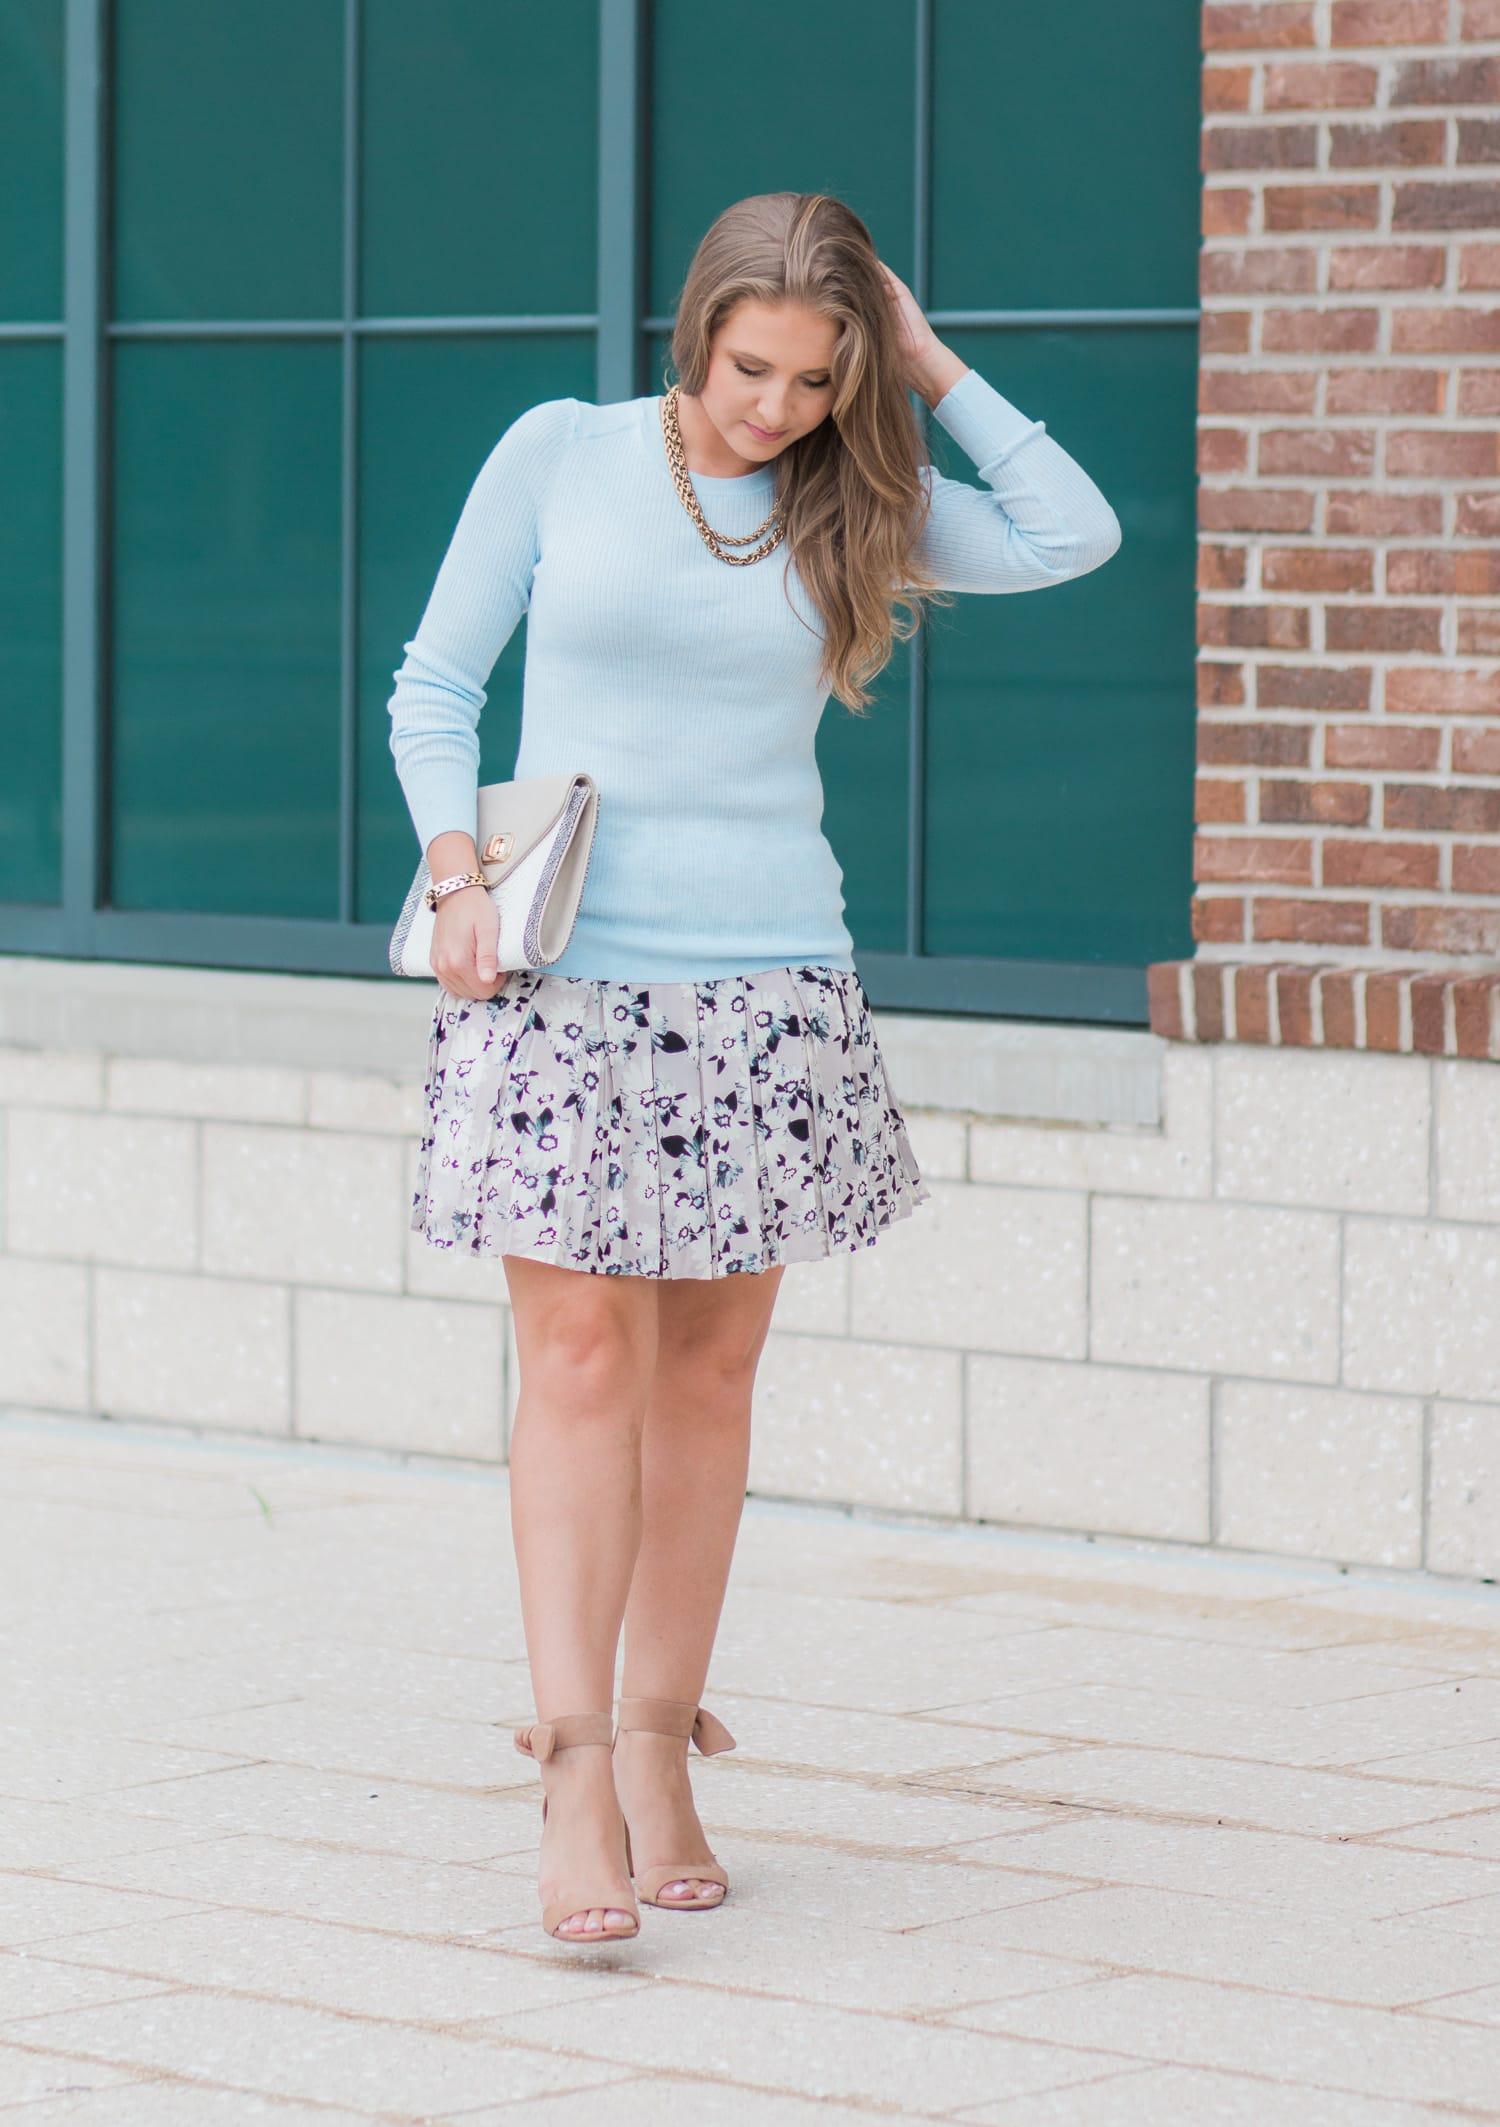 Summer to Fall Banana Republic Outfit | Ashley Brooke Nicholas